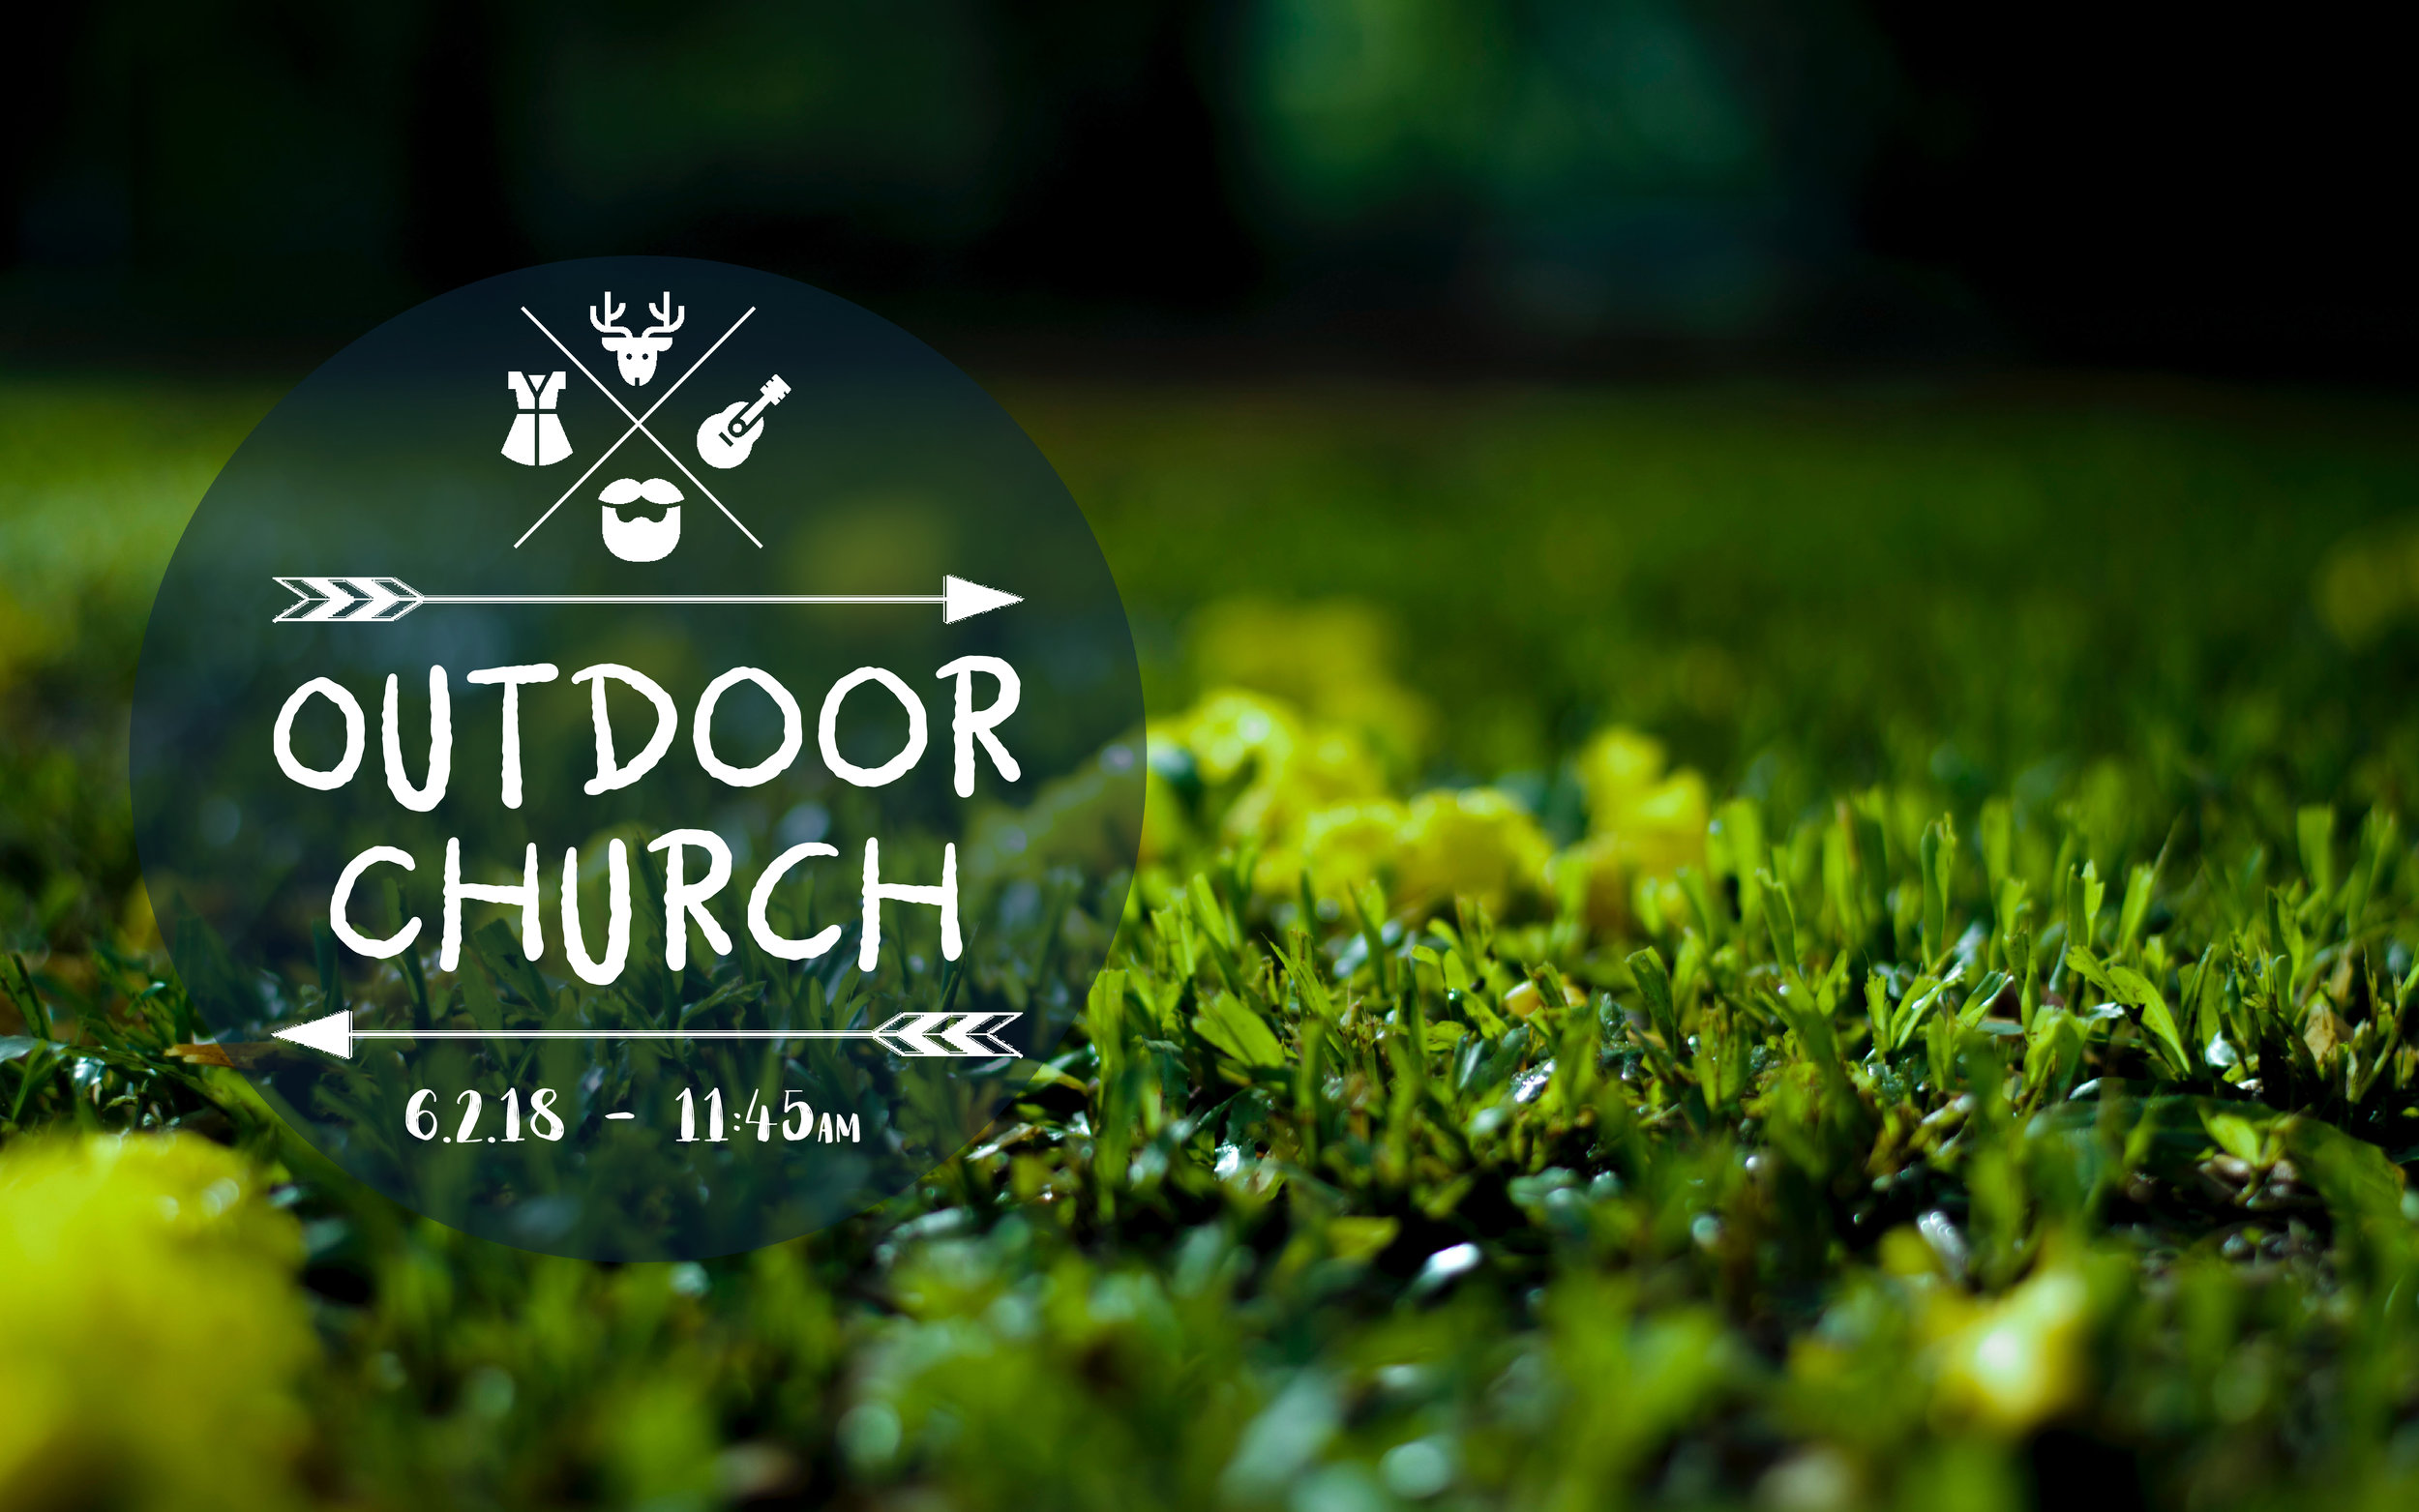 Outdoor Church2.jpg